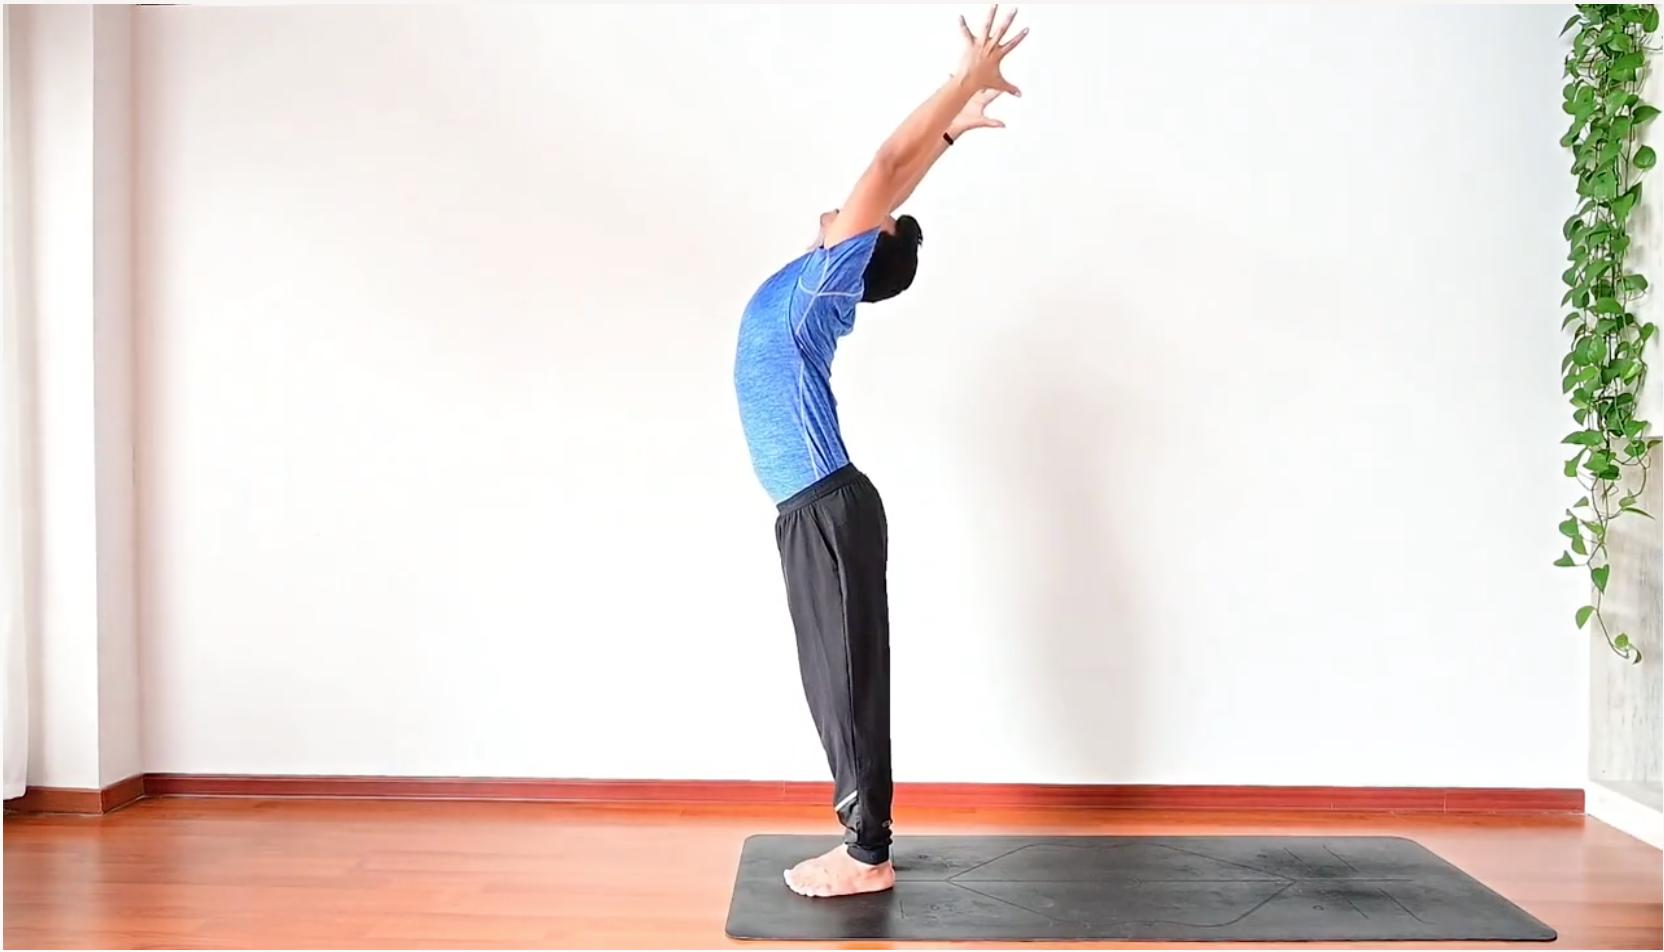 Hatha Yoga Sun Salutation Step By Step Instruction Surya Namaskar Sivana East In 2020 Hatha Yoga Yoga Sun Salutation Surya Namaskar